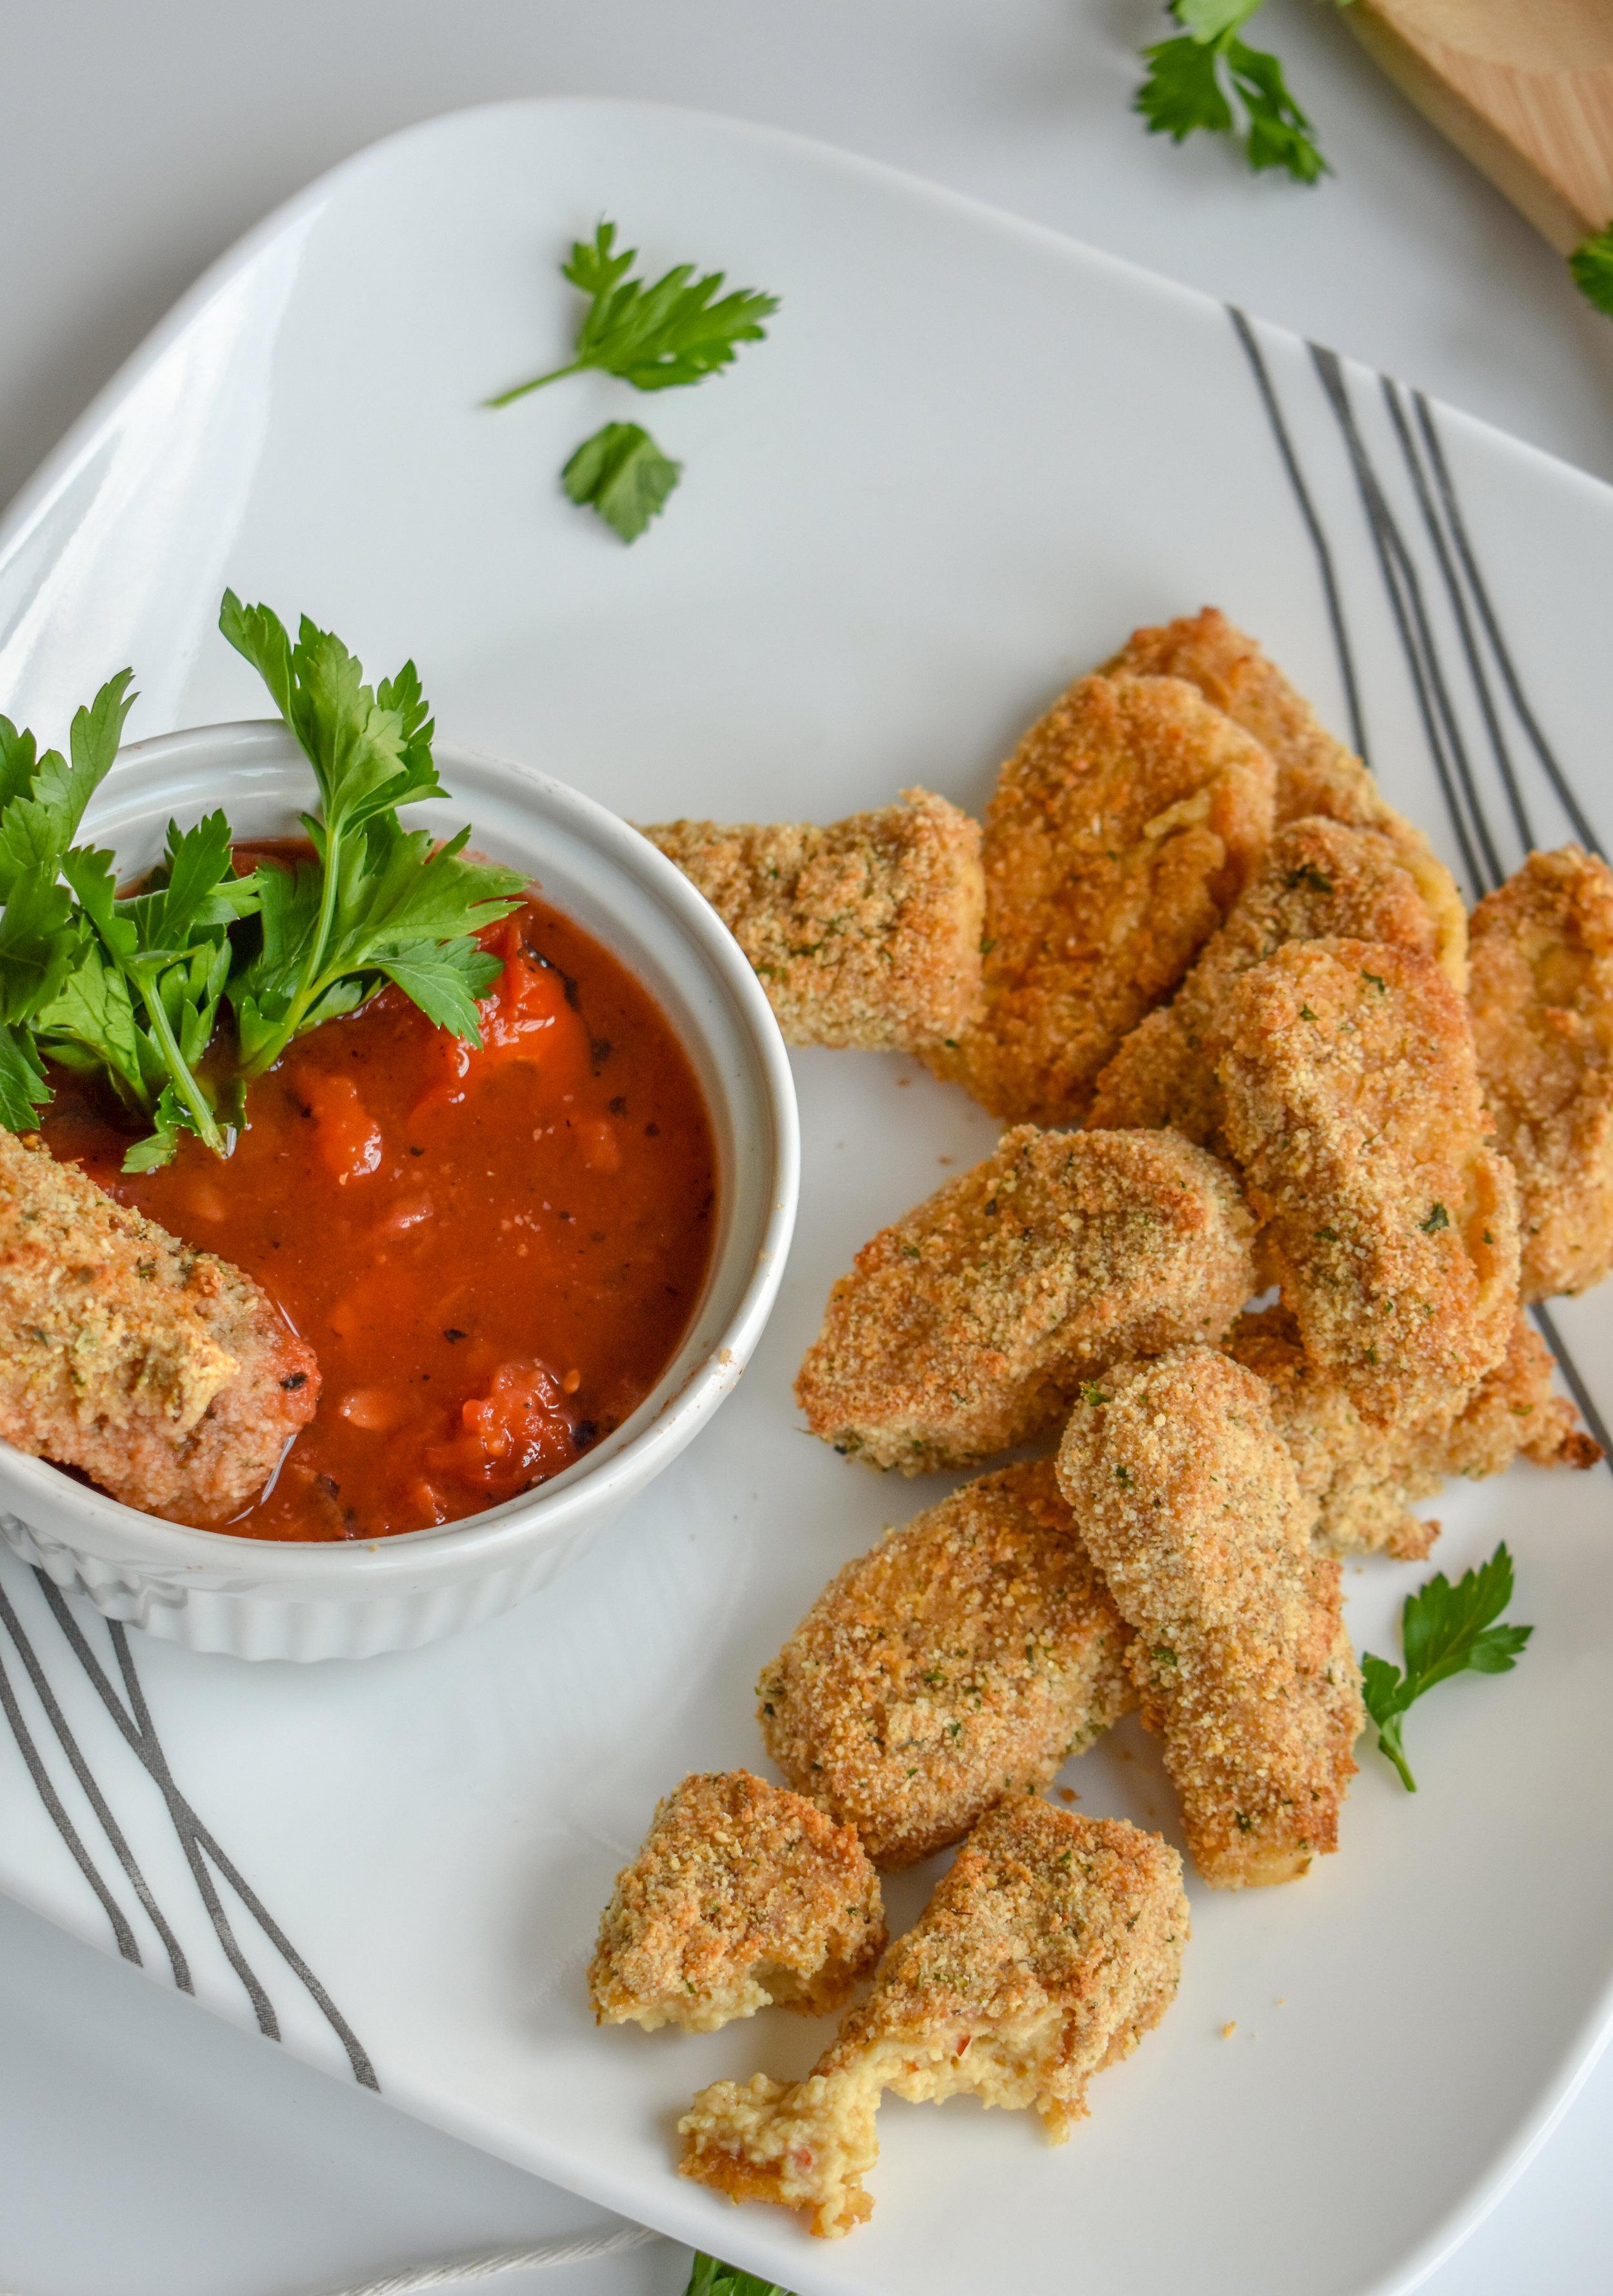 10. Serve the mozzarella sticks with a tomato sauce for dipping. Yum!